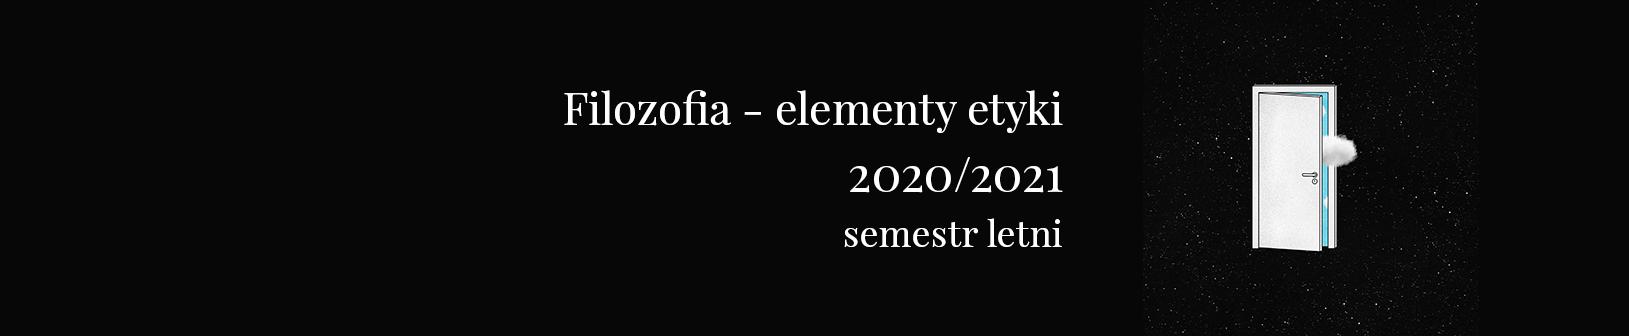 Course Image Filozofia - elementy etyki